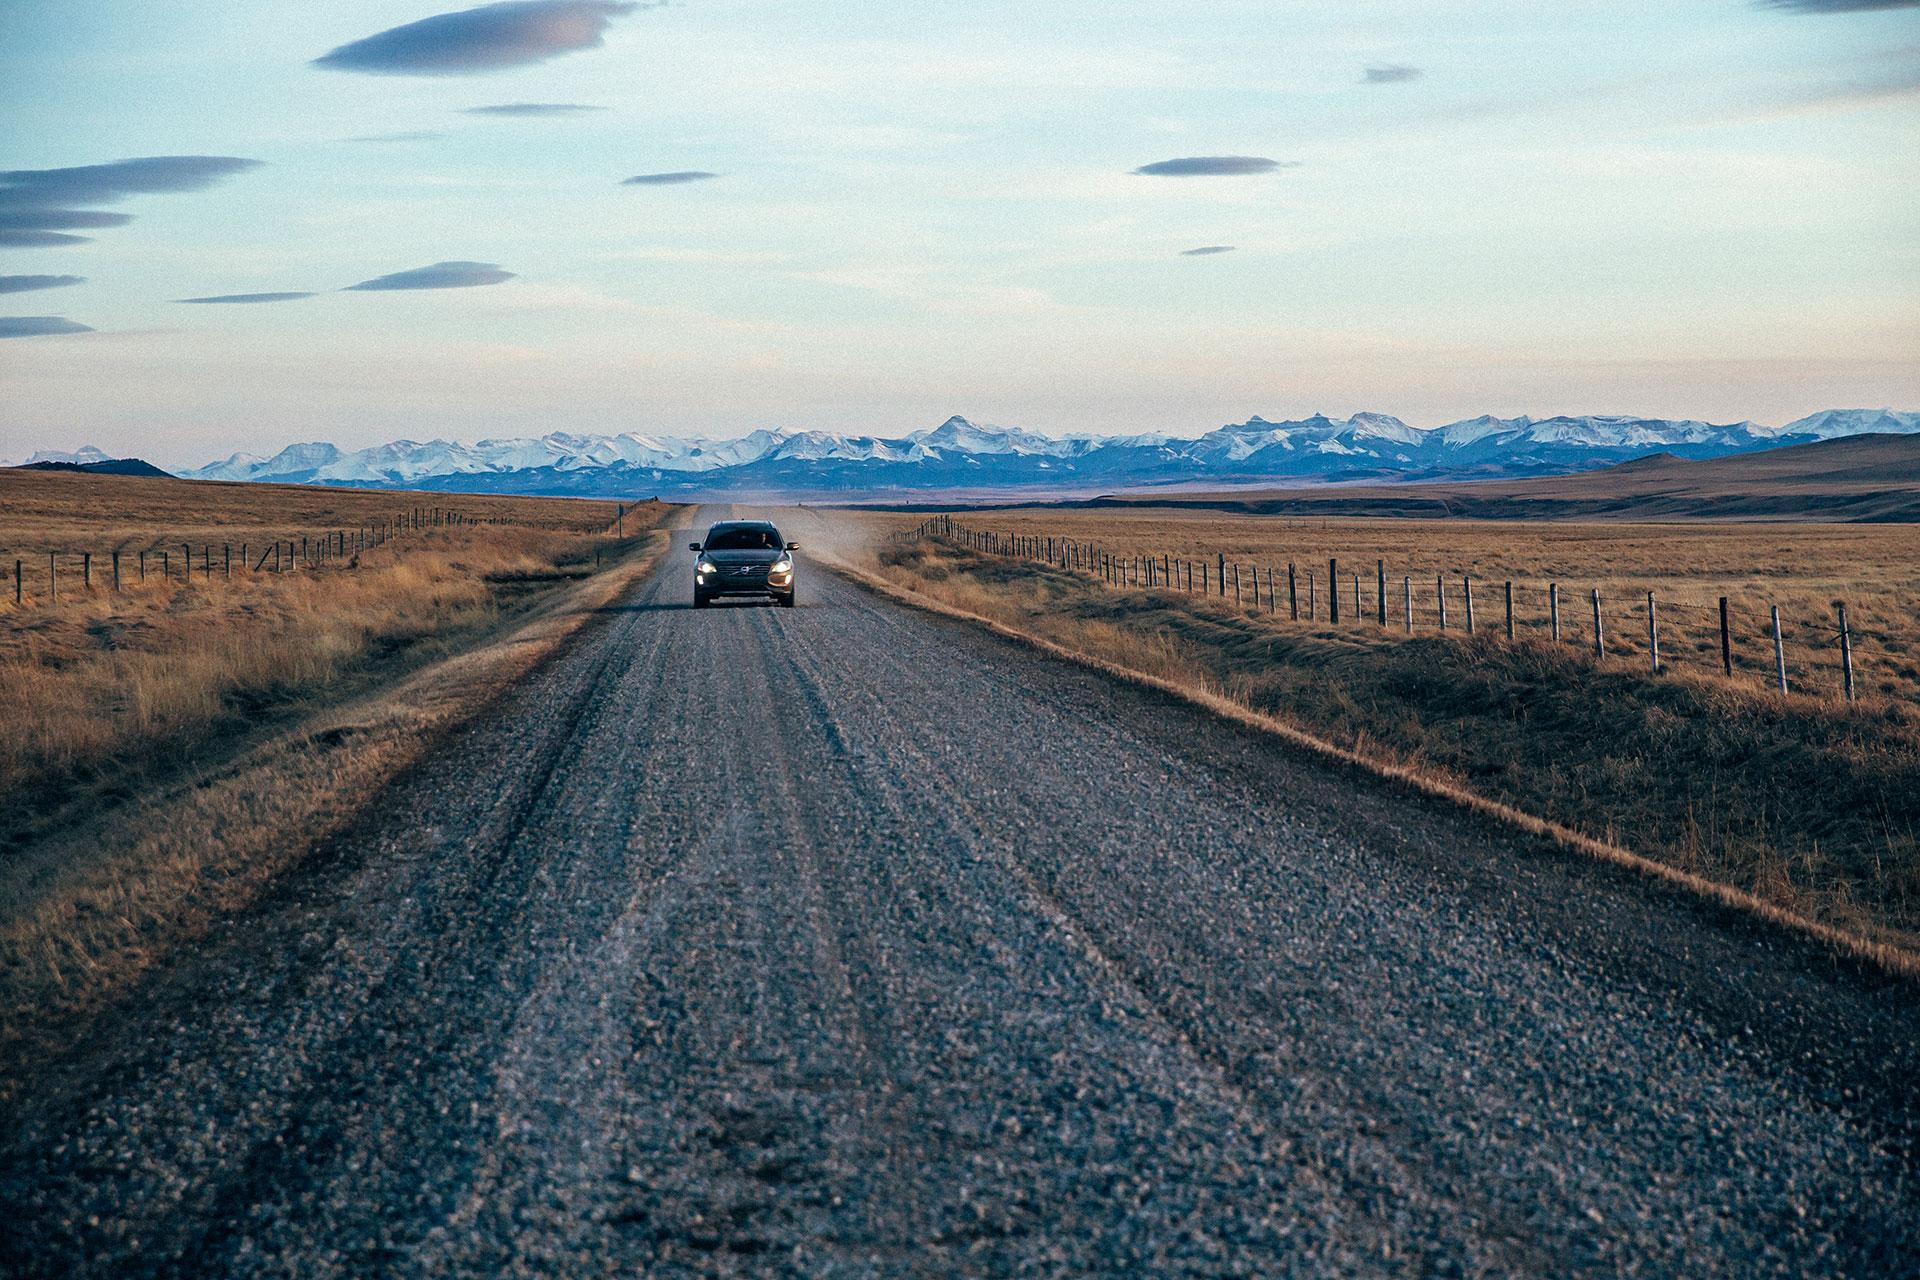 Travel Reisen Fotograf Outdoor Wandern Landschaft Automotive Volvo Michael Müller London UK